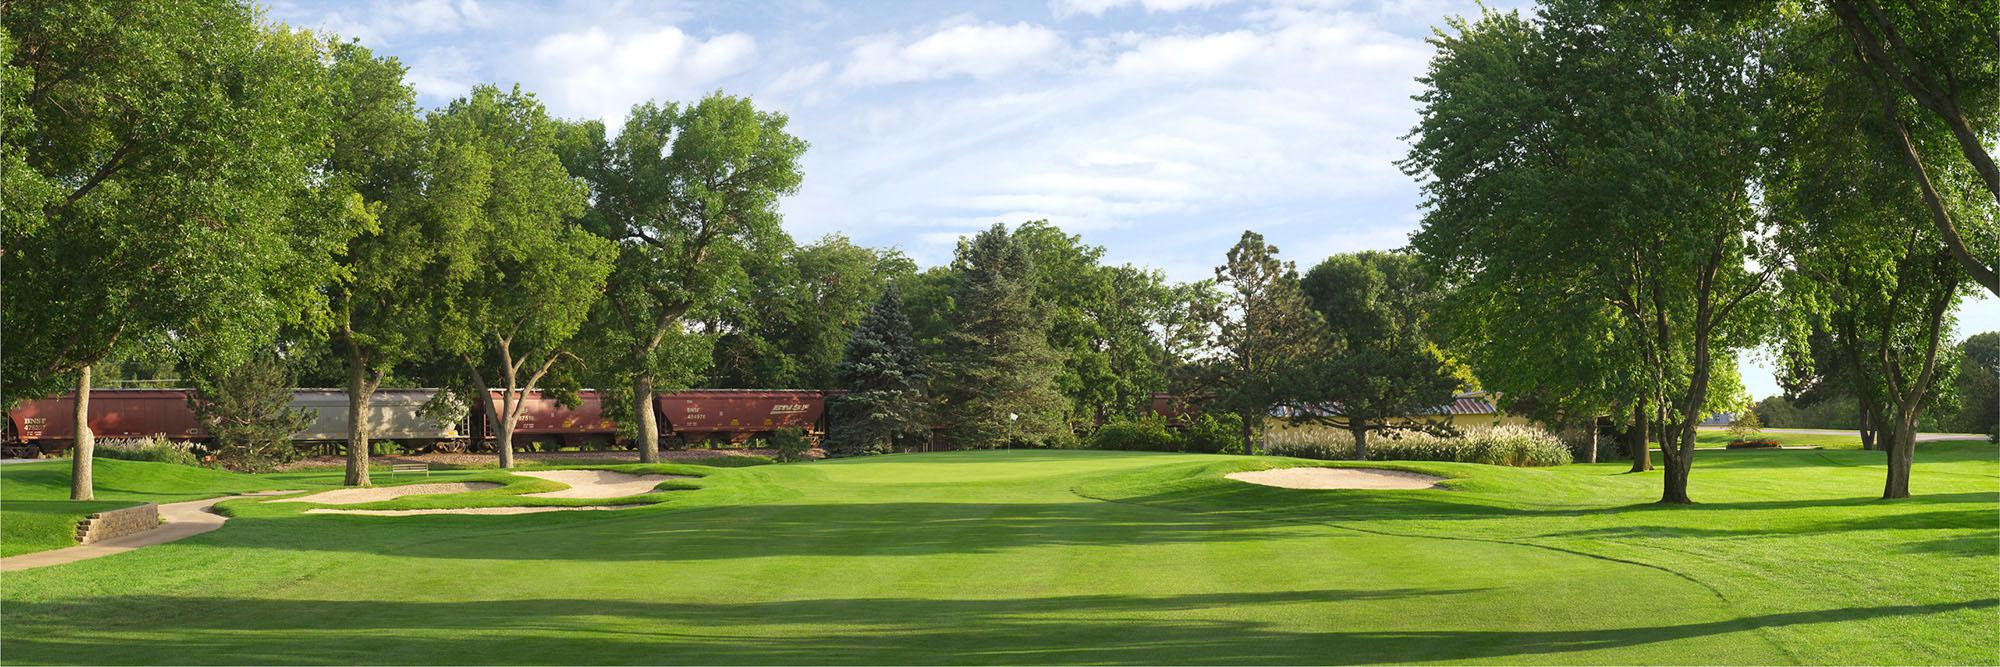 Golf Course Image - Fremont No. 1